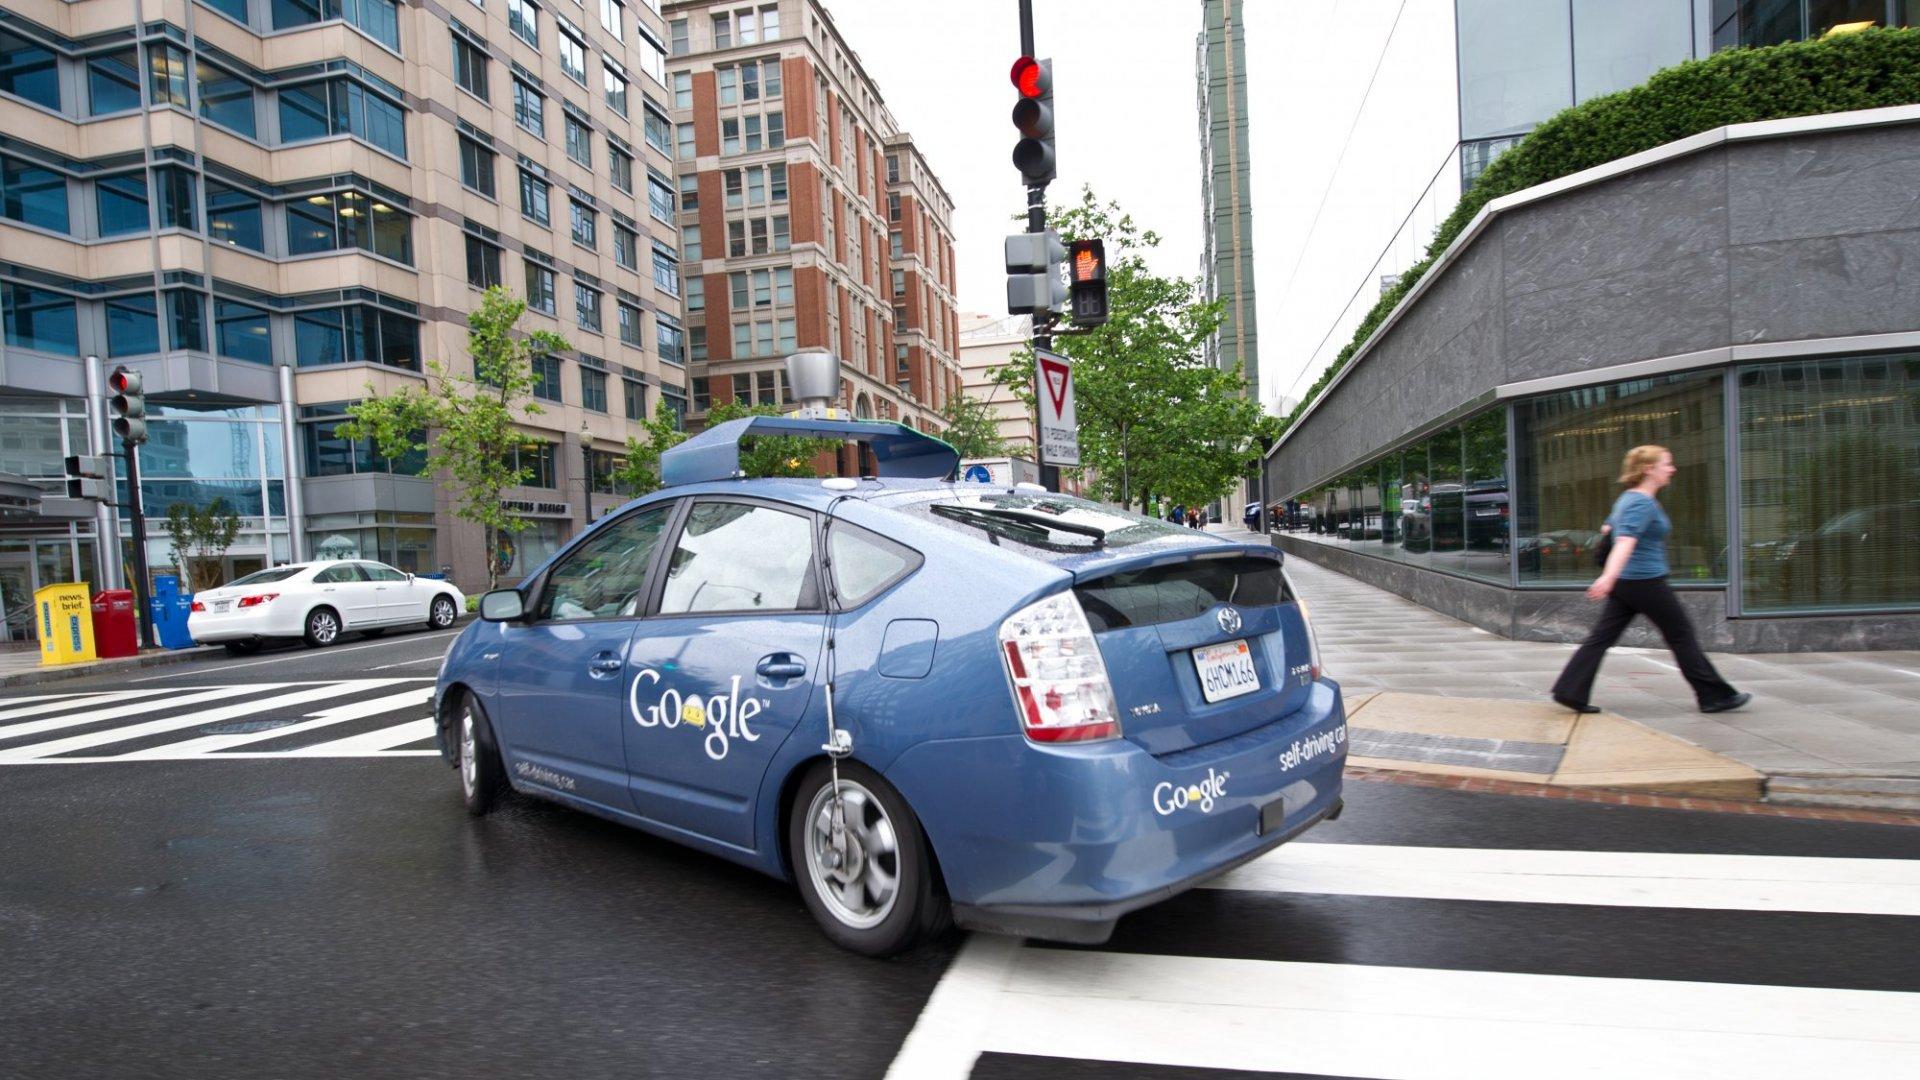 A Google self-driving car makes a right turn on a Washington, D.C. street.